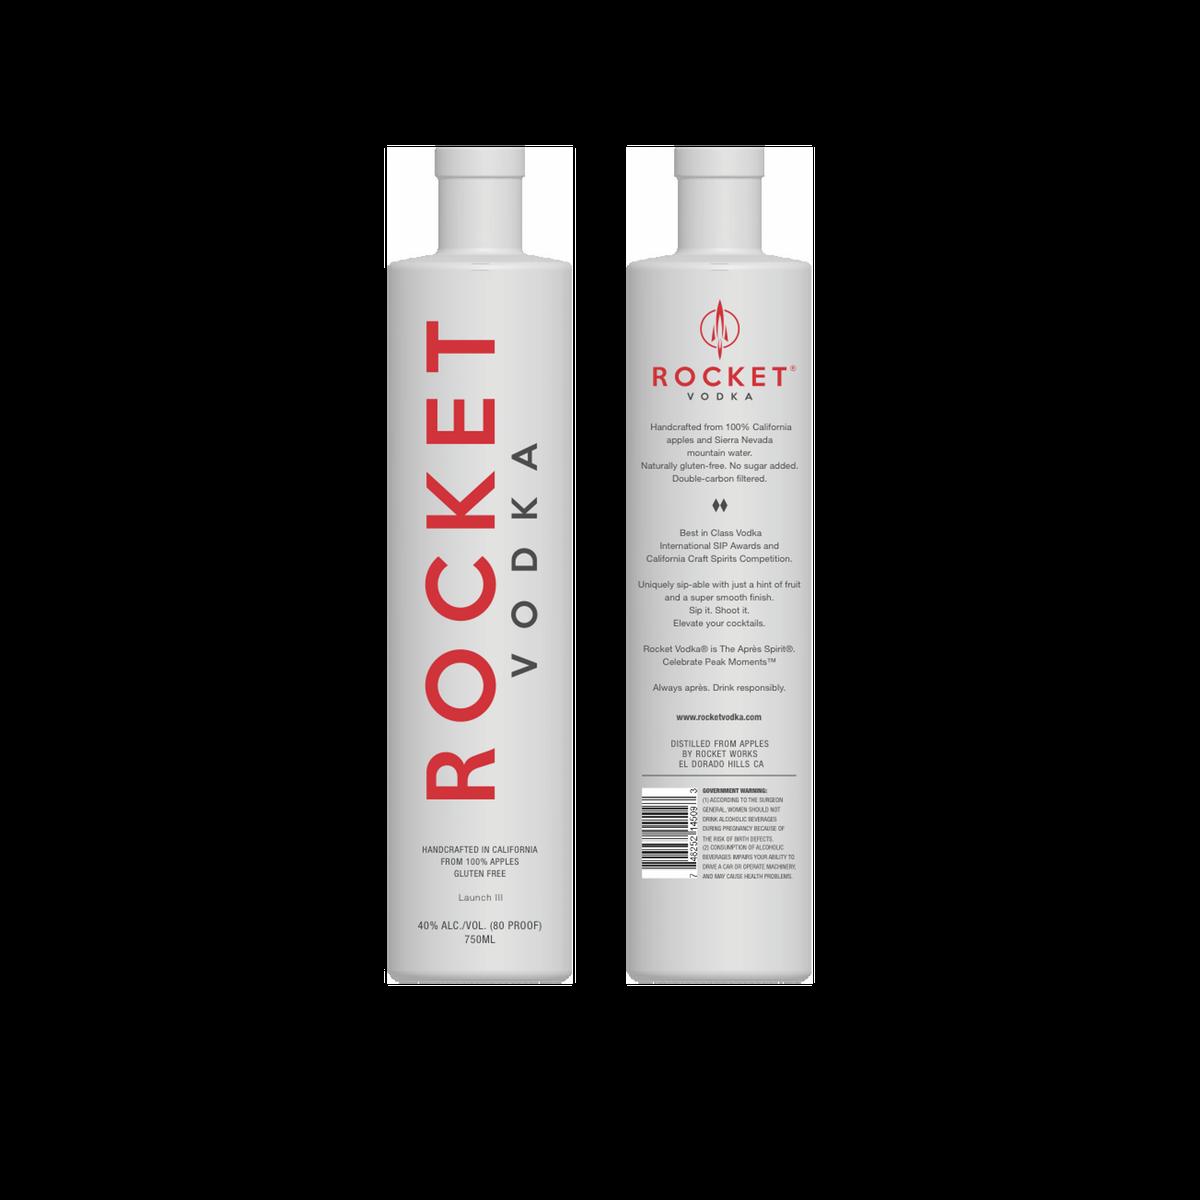 Rocket Vodka Launch III